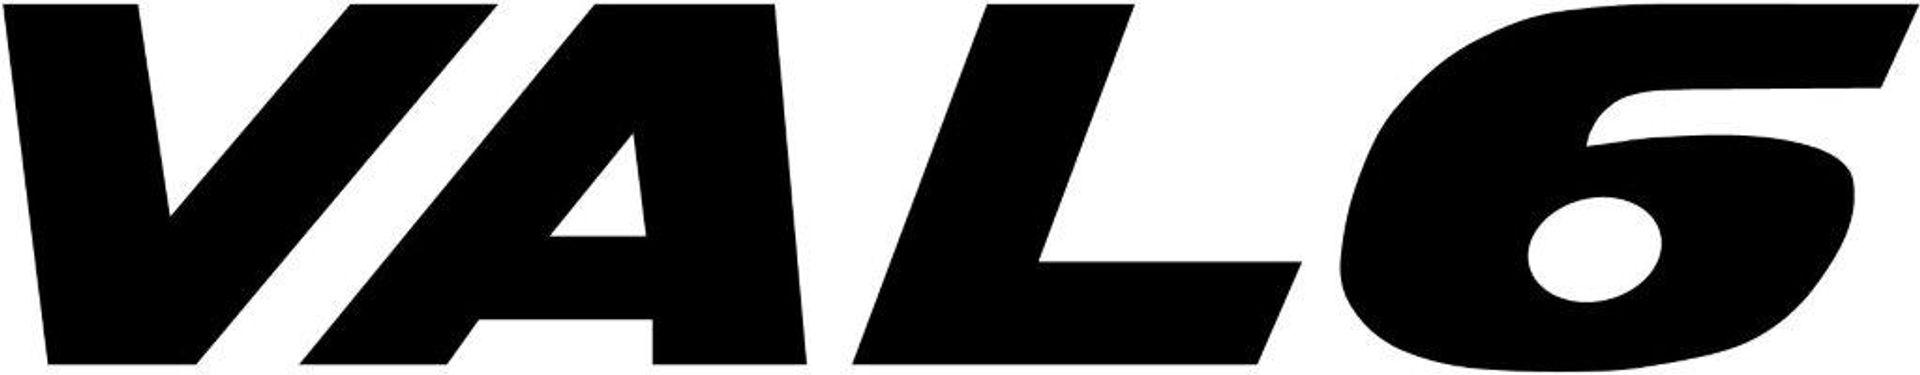 Val 6 Radiant Heater logo